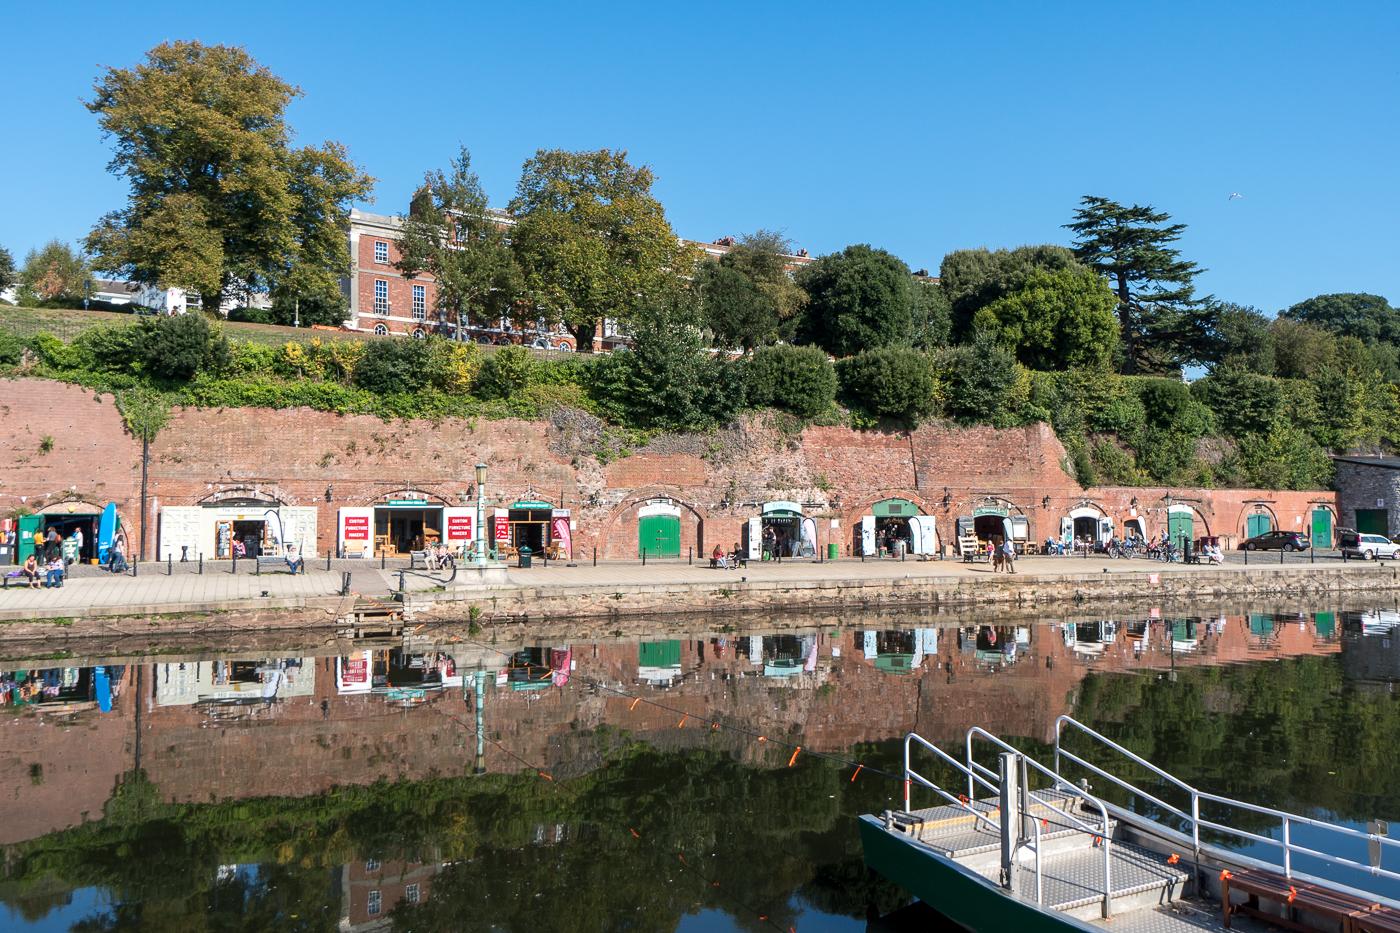 Exeter Quayside - promenade au bord de l'eau